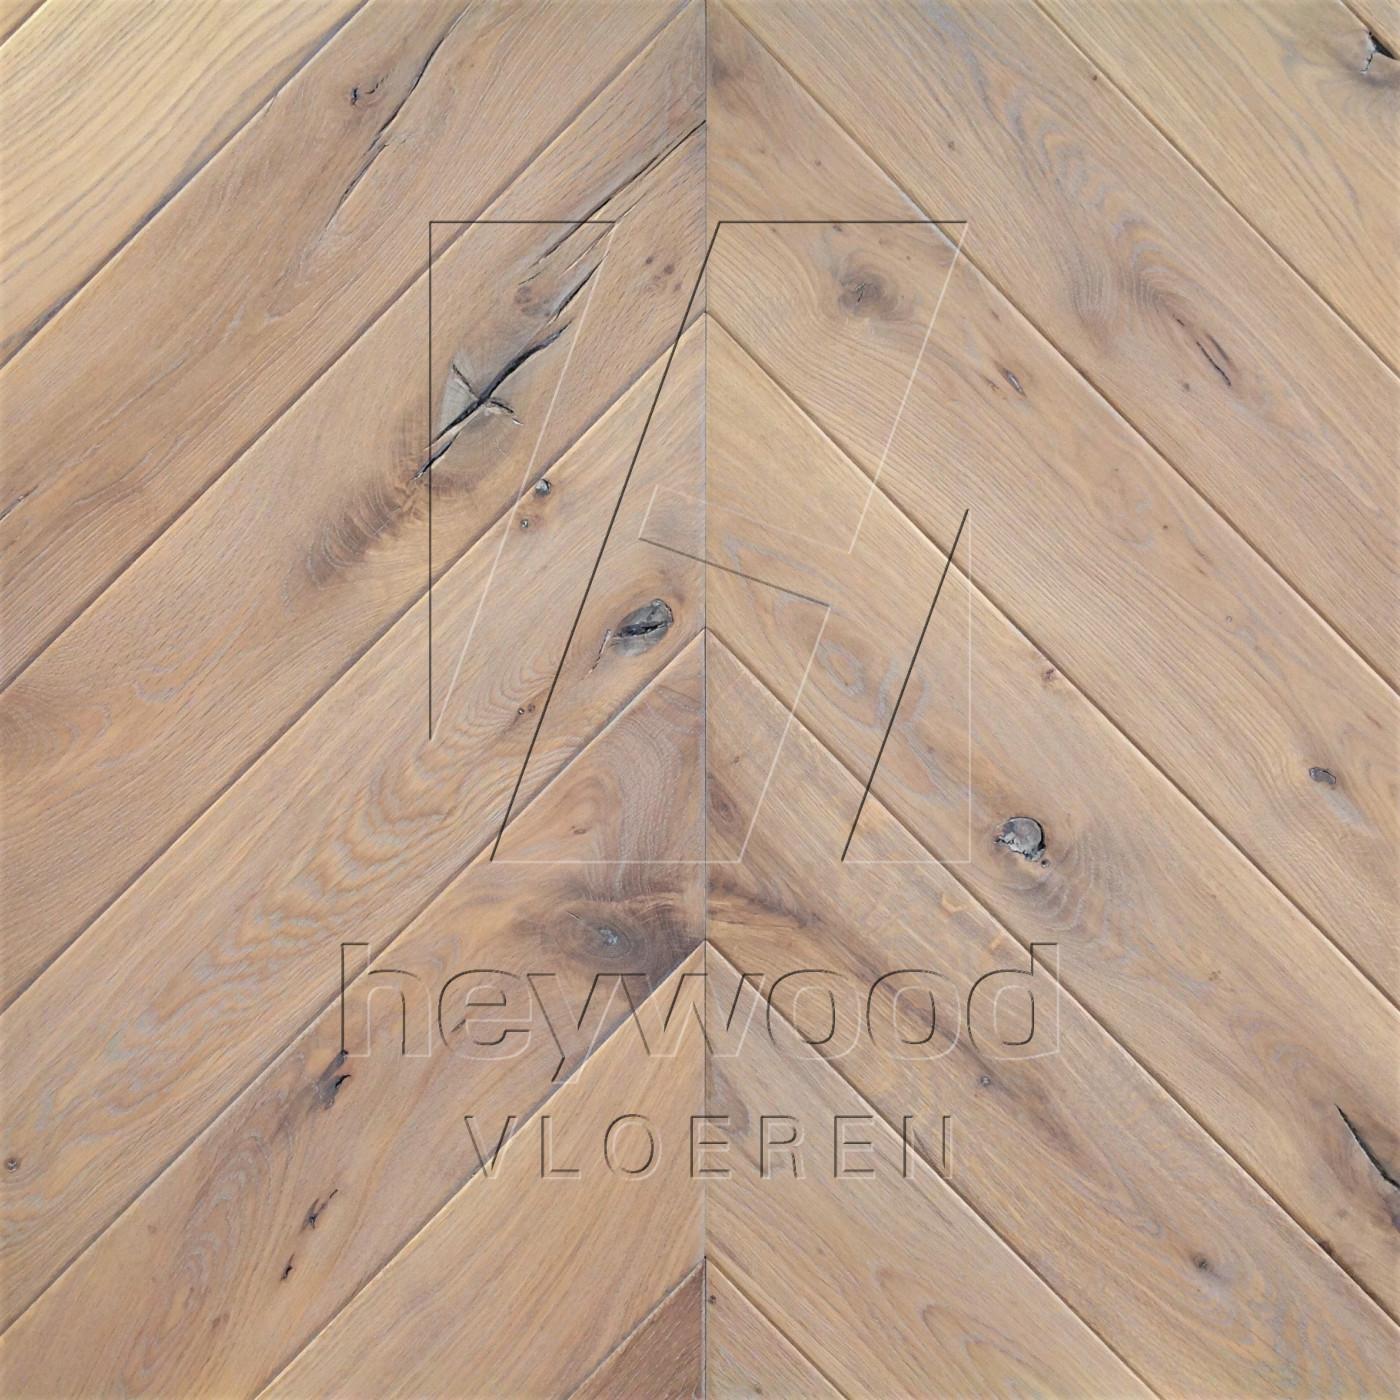 Antique Chevron 'Gaula coloured' in Chevron of Pattern & Panel Floors